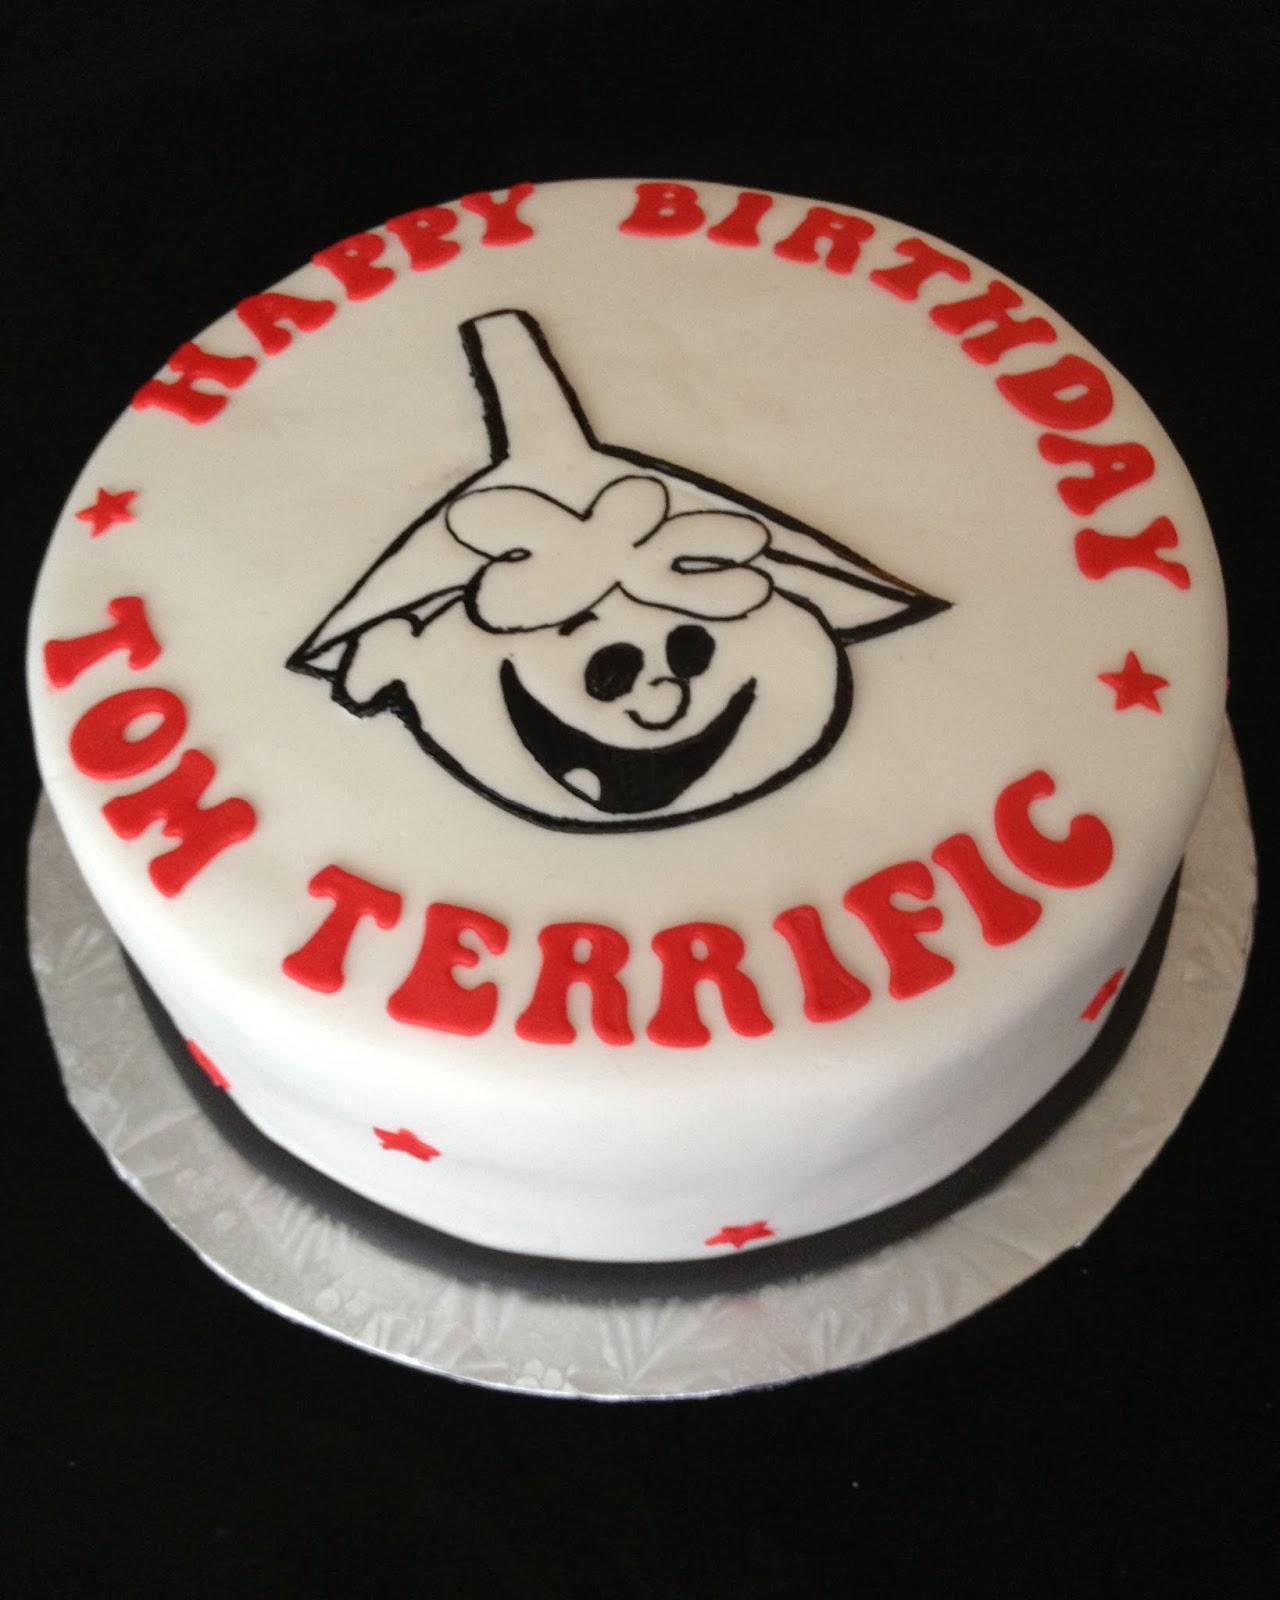 Tom Terrific Birthday Cake